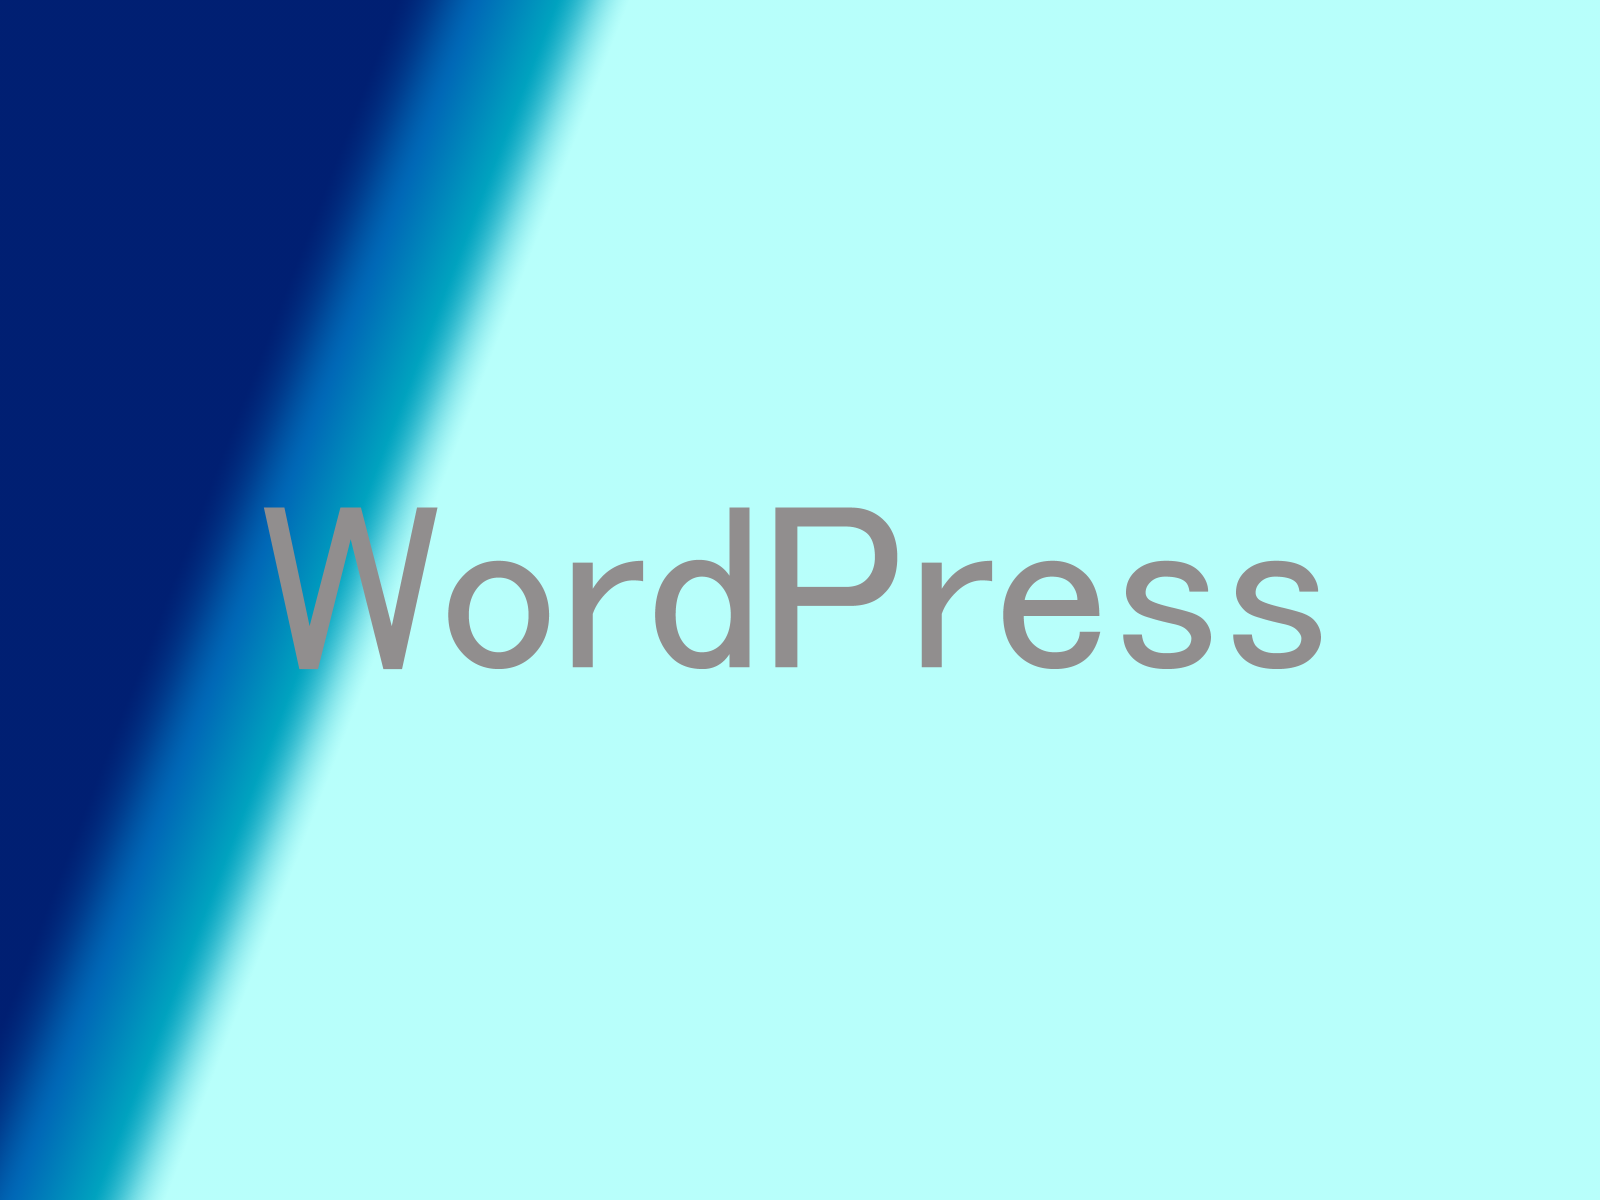 WordPressのイラスト